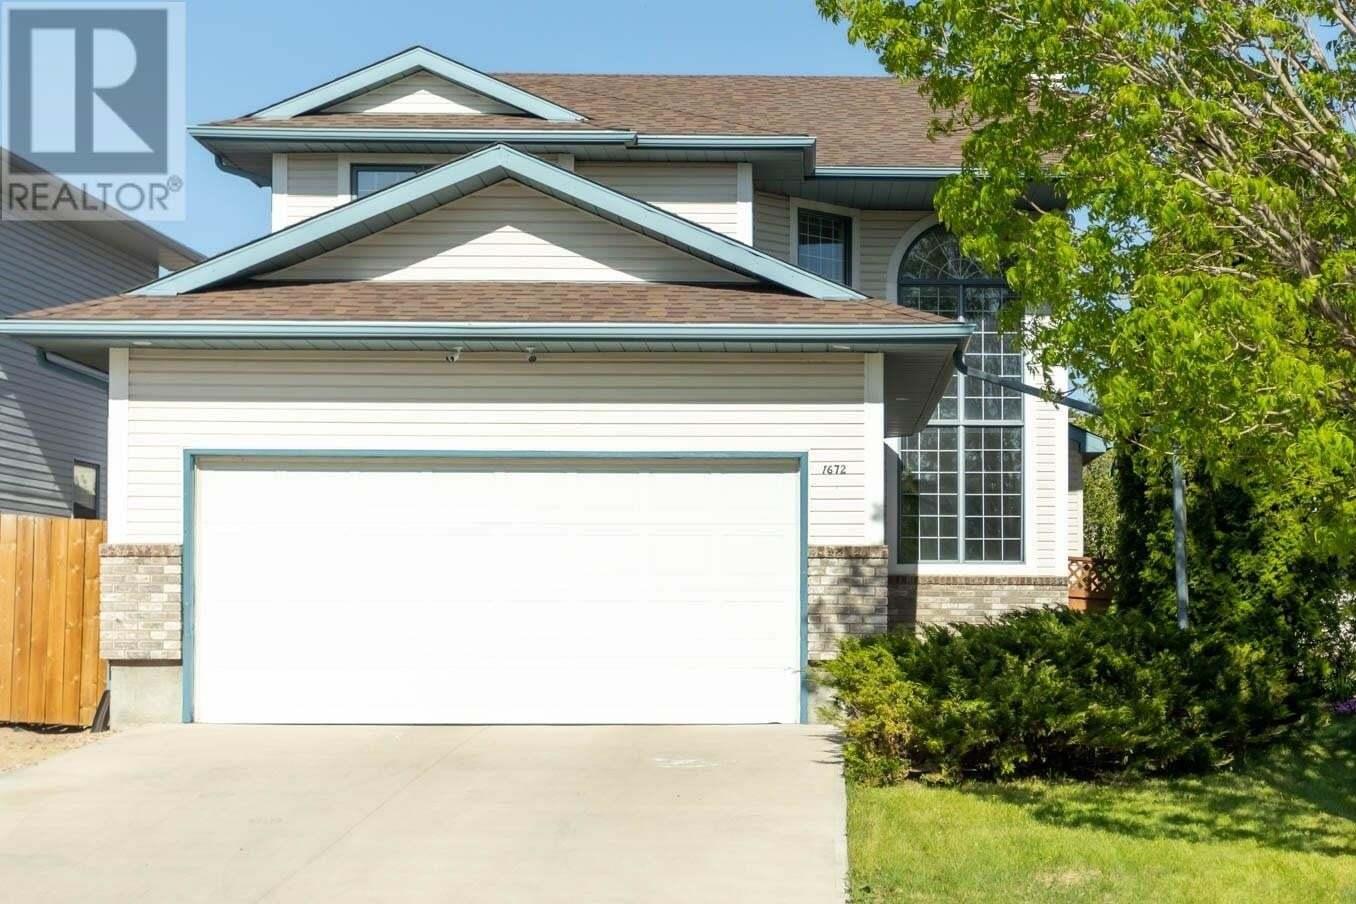 House for sale at 1672 Rousseau Cres N Regina Saskatchewan - MLS: SK816833